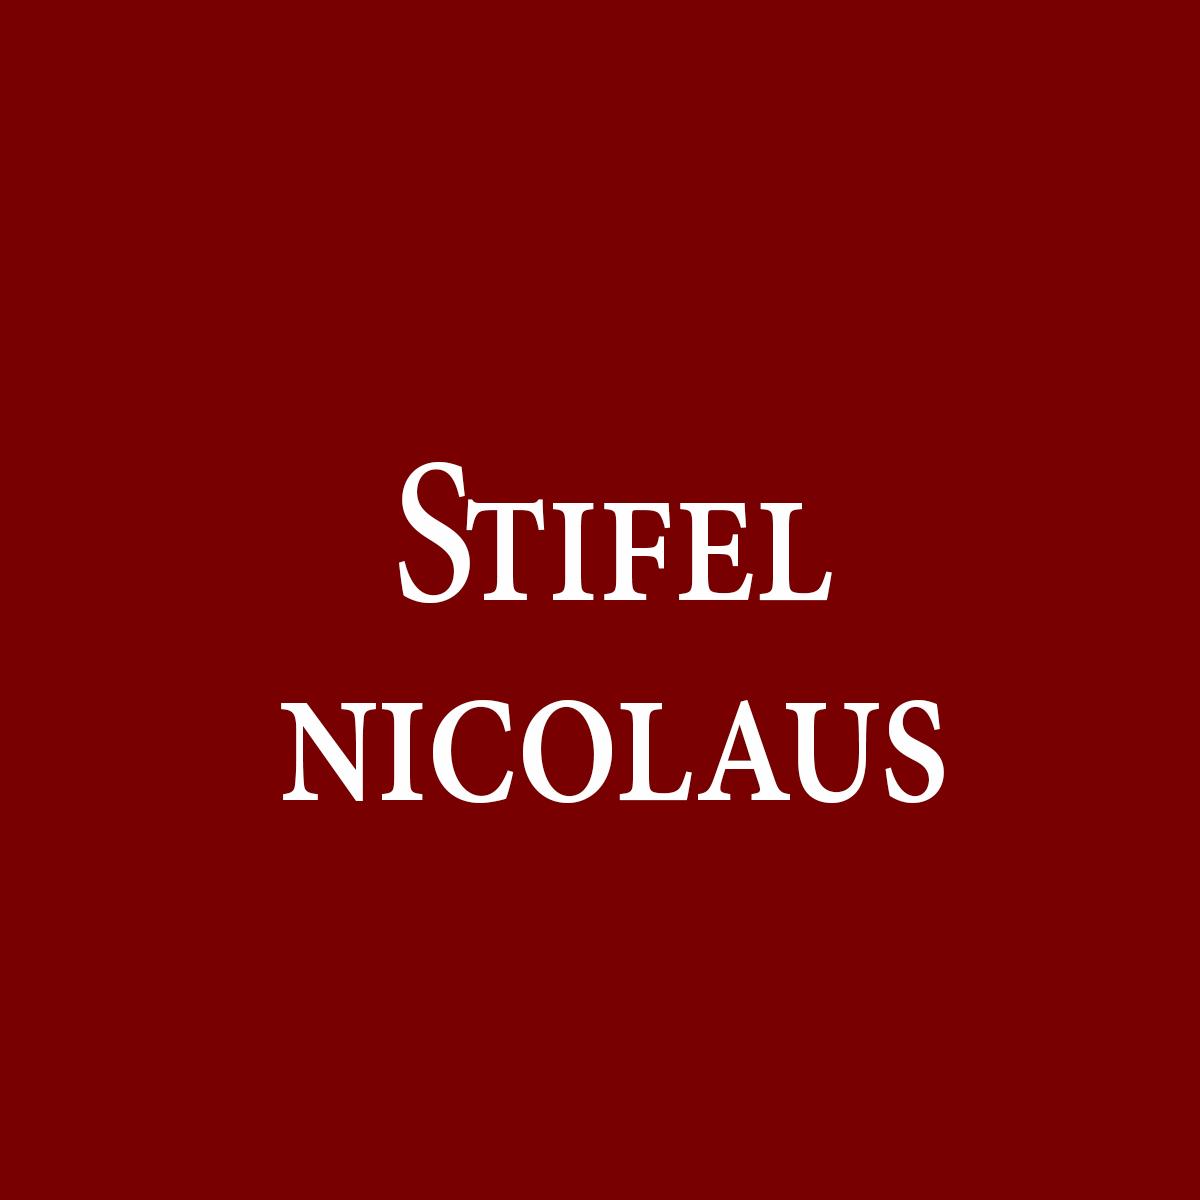 StifelNicolaus.png